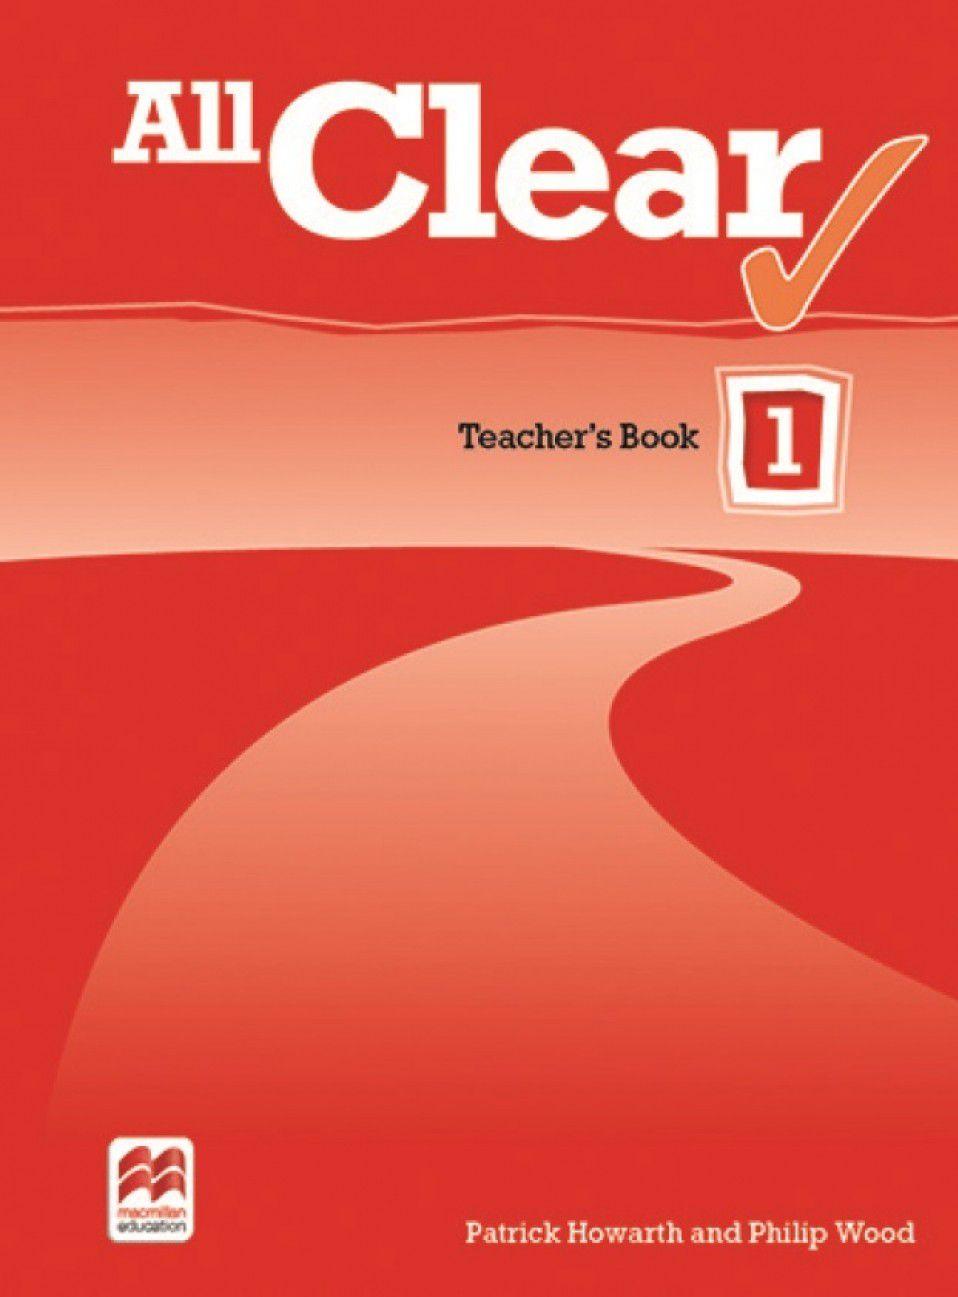 ALL CLEAR TEACHERS BOOK PACK-1